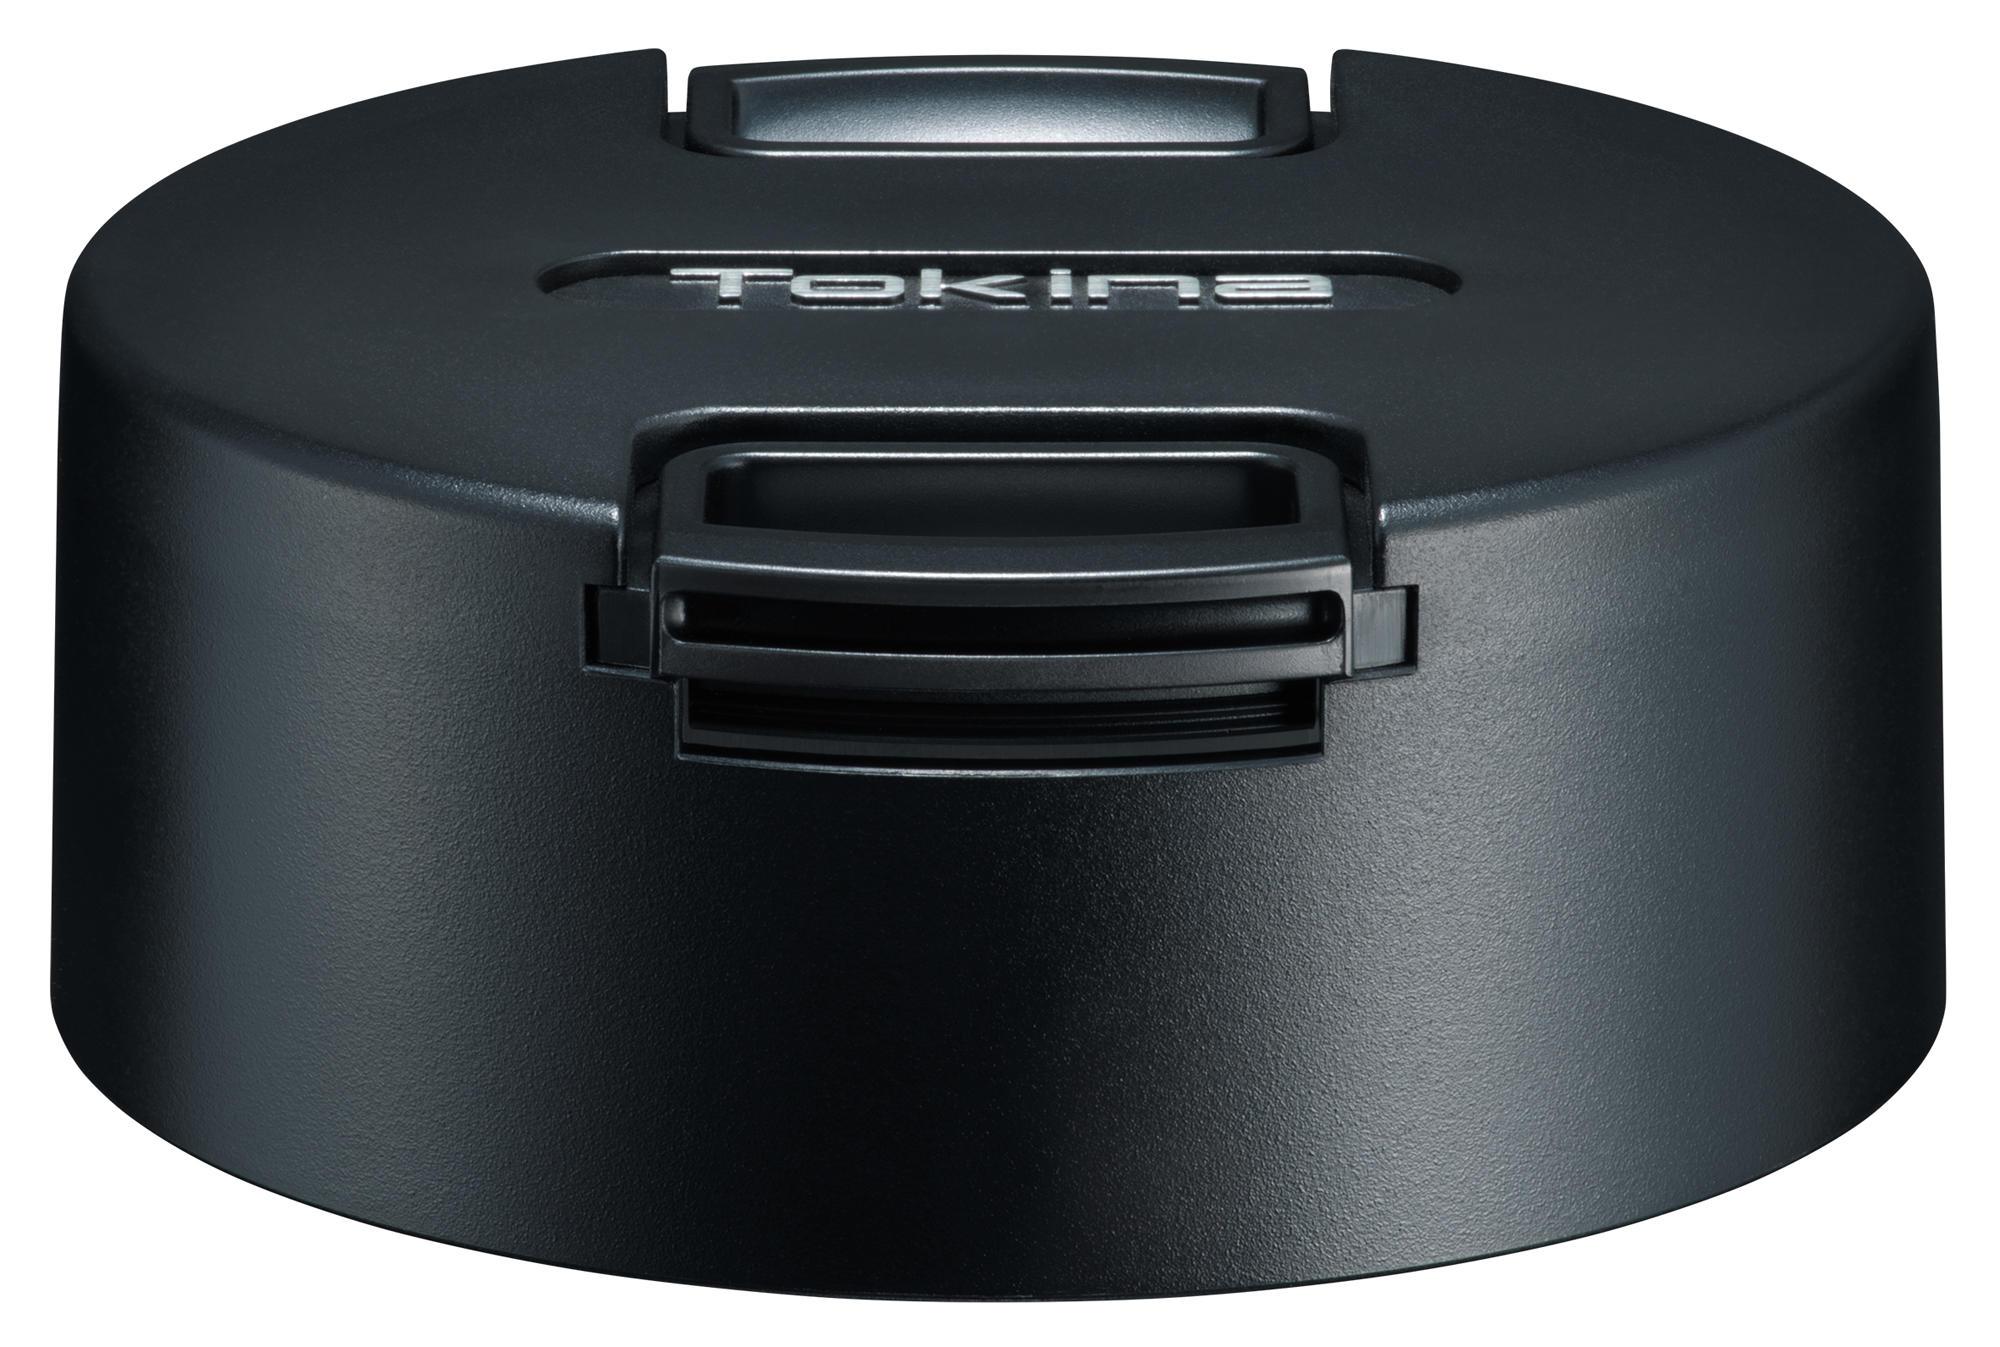 https://www.kenko-tokina.co.jp/camera-lens/tokina/mt-images/opera16_28_cap.jpg